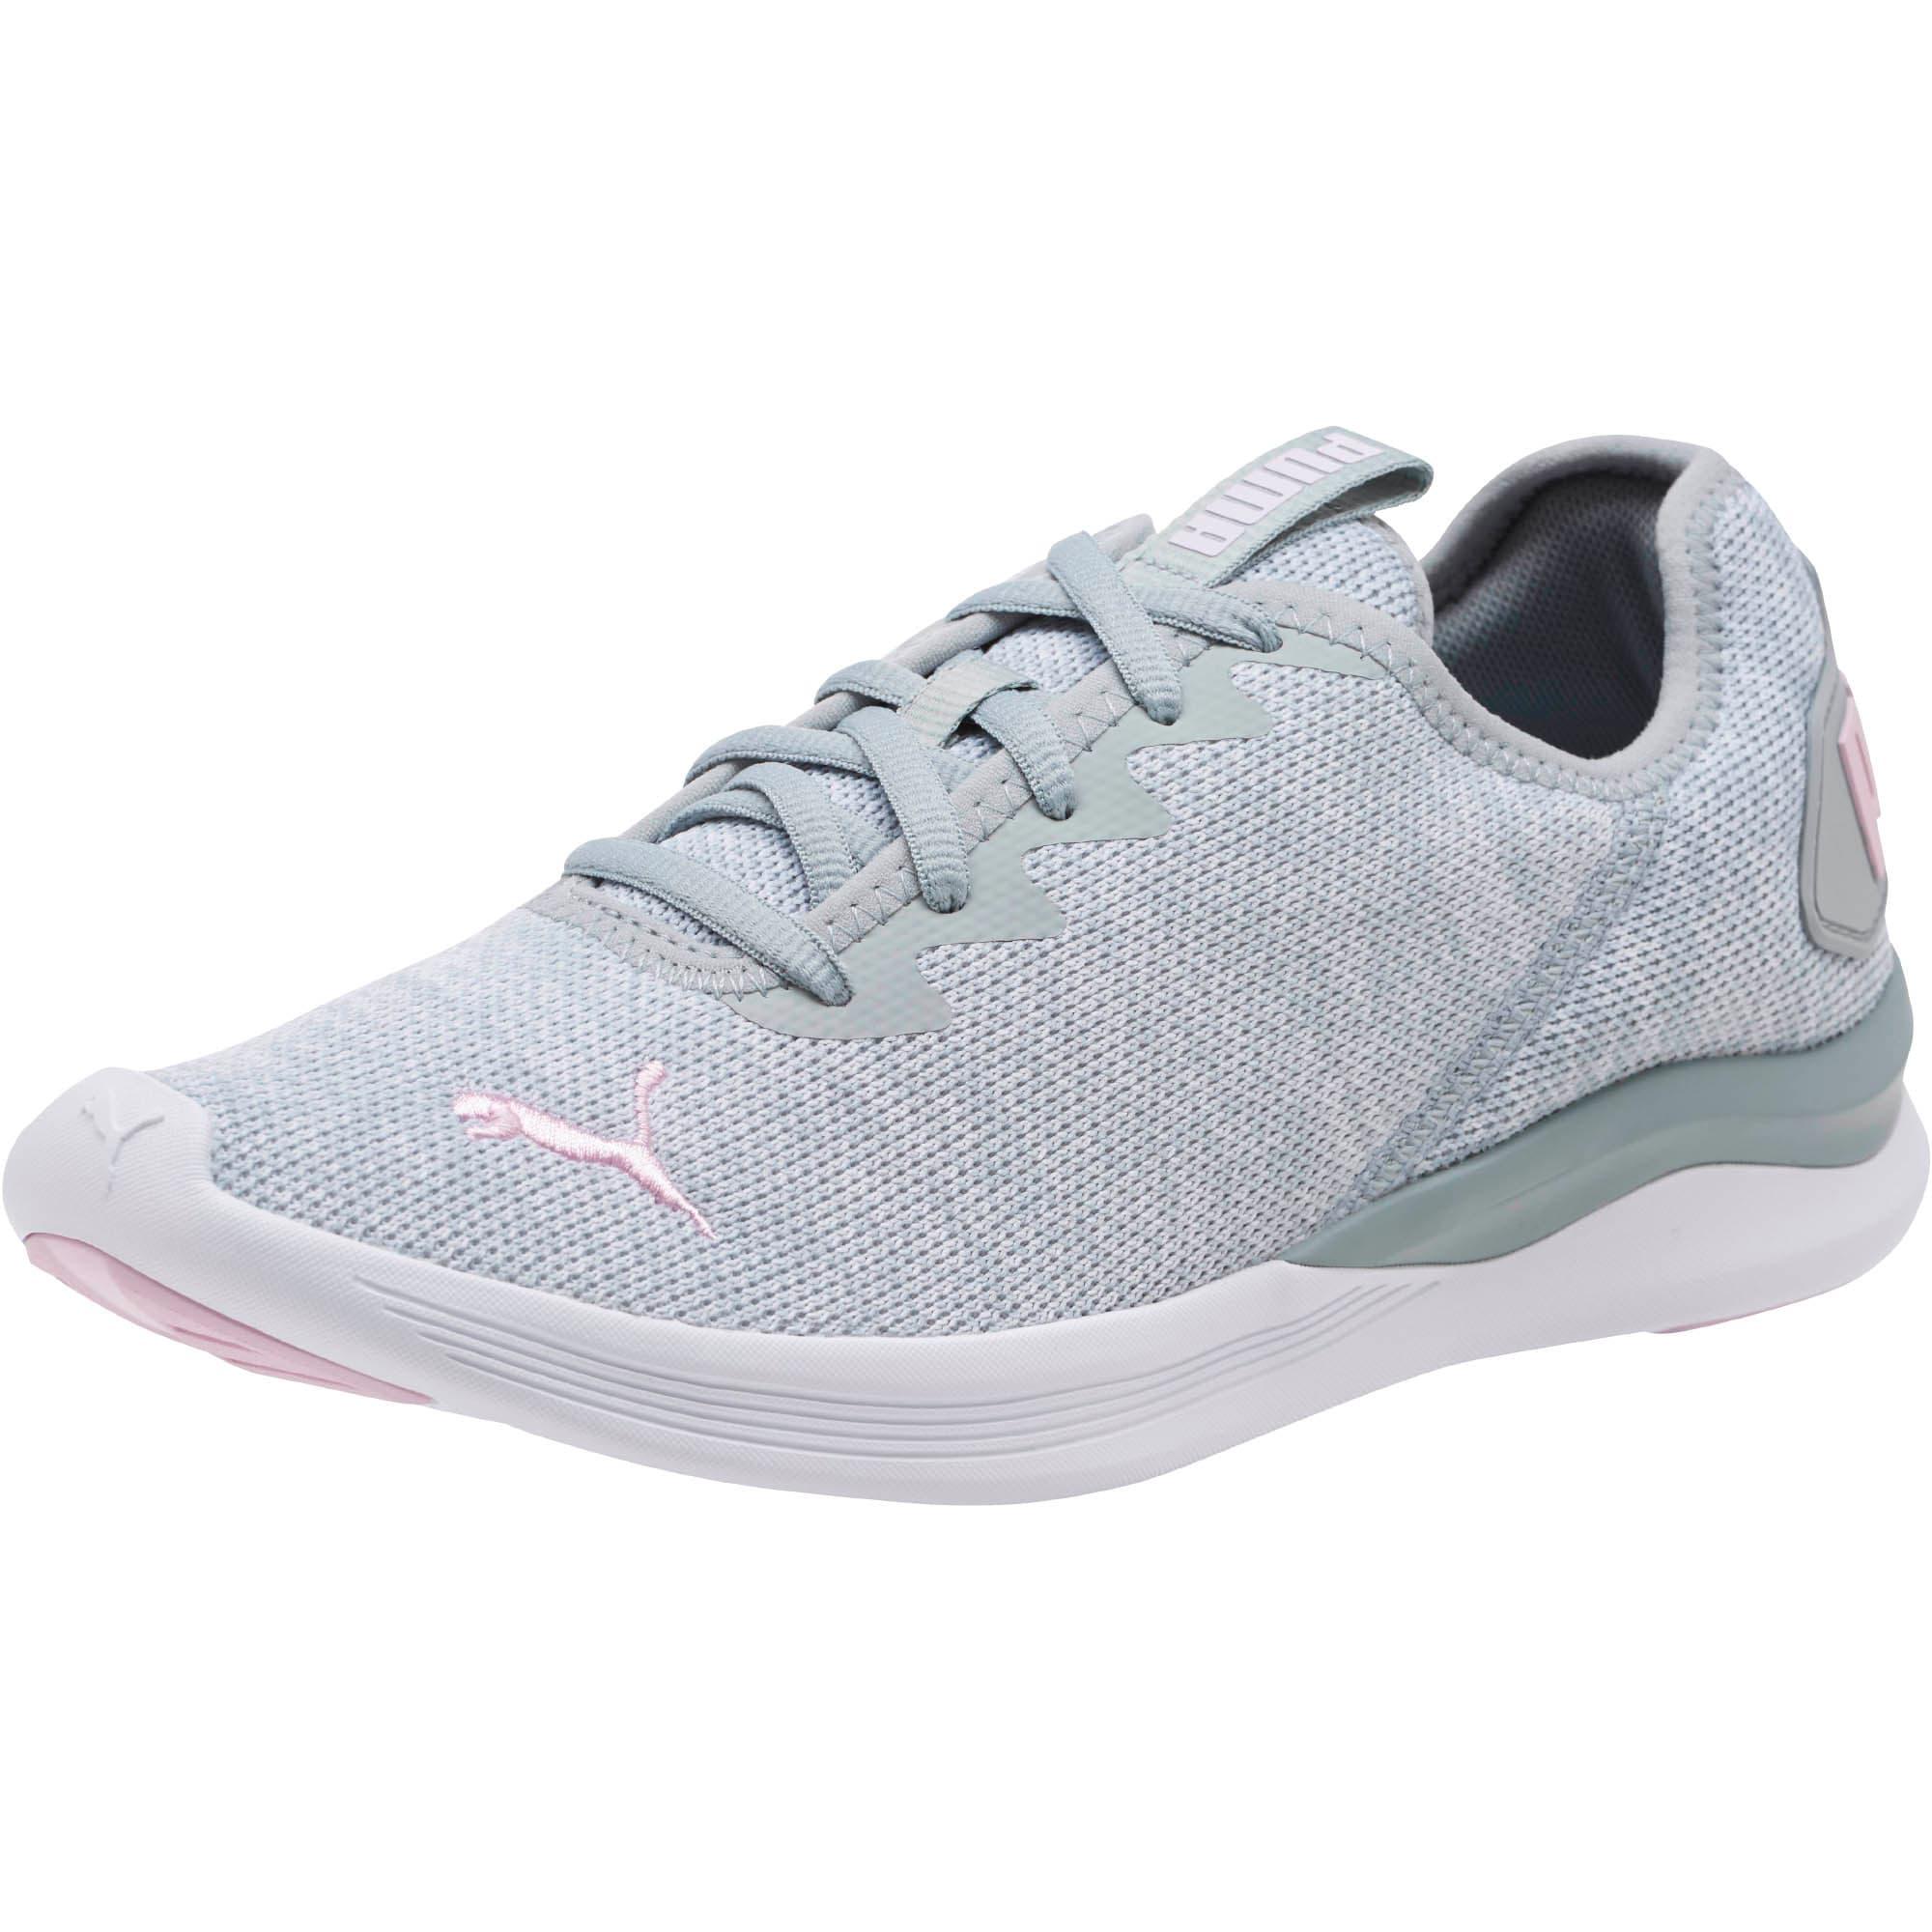 Thumbnail 1 of Ballast Women's Running Shoes, Quarry- Orchid- White, medium